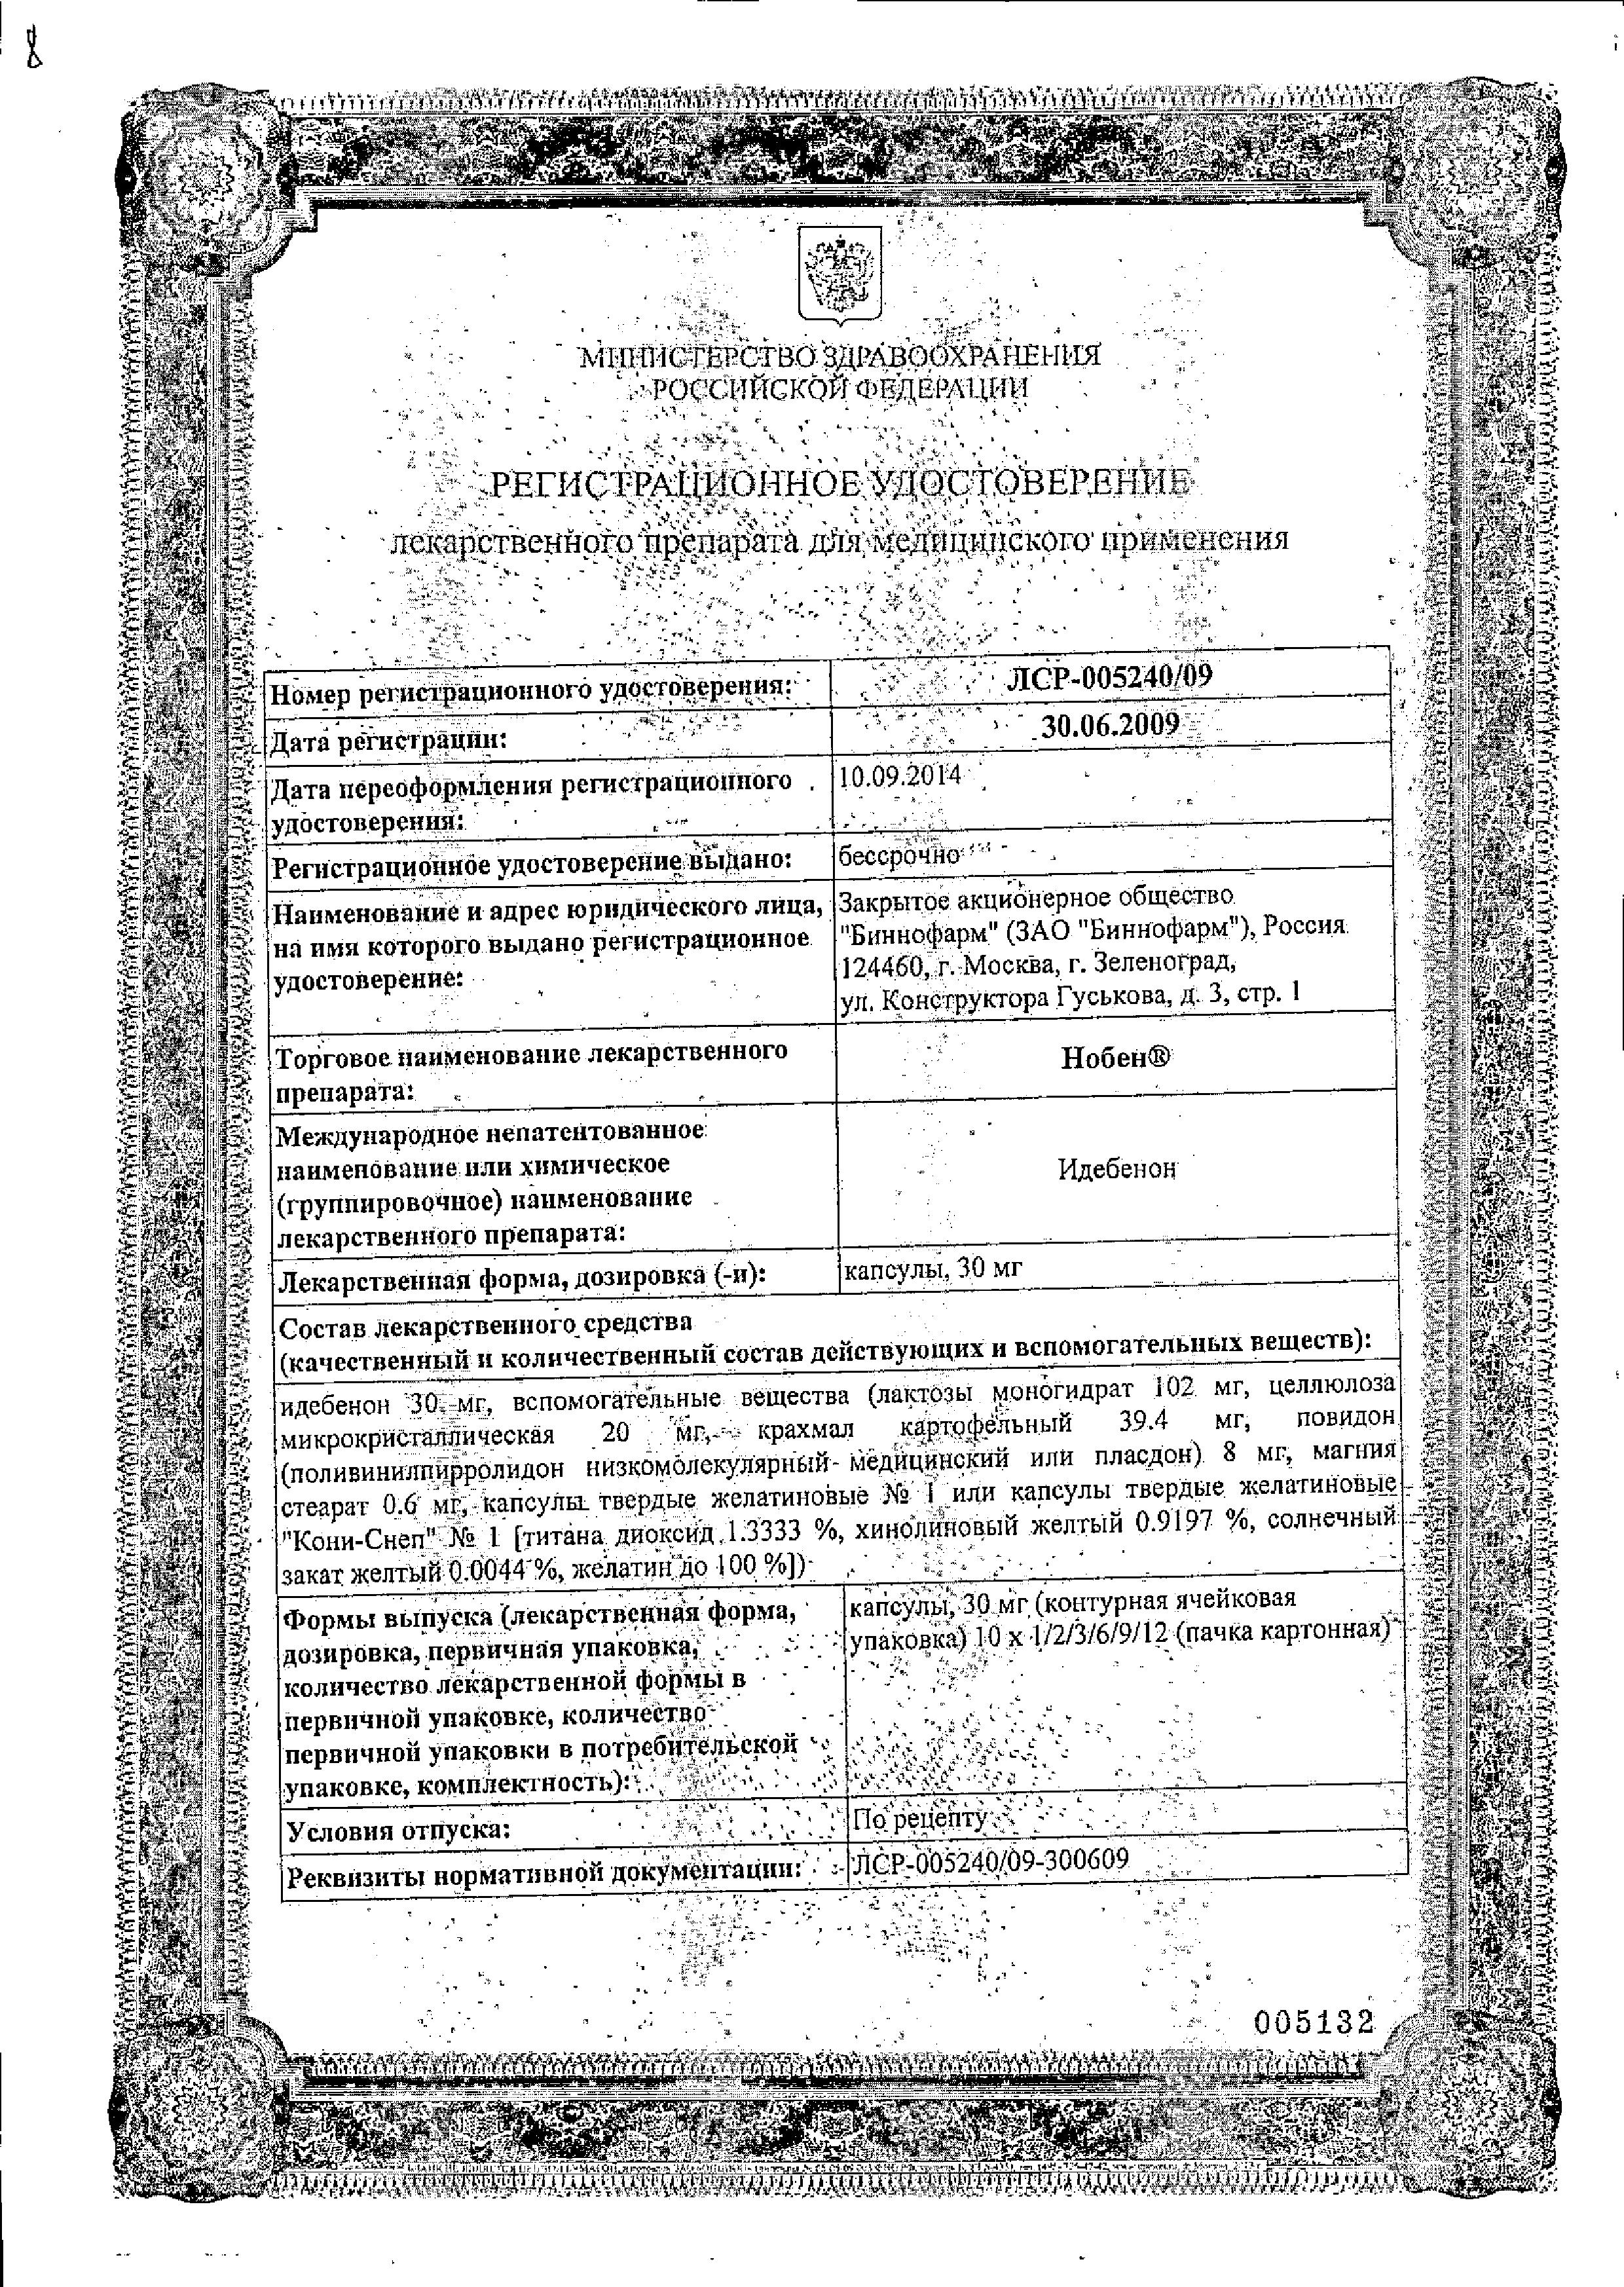 Нобен сертификат